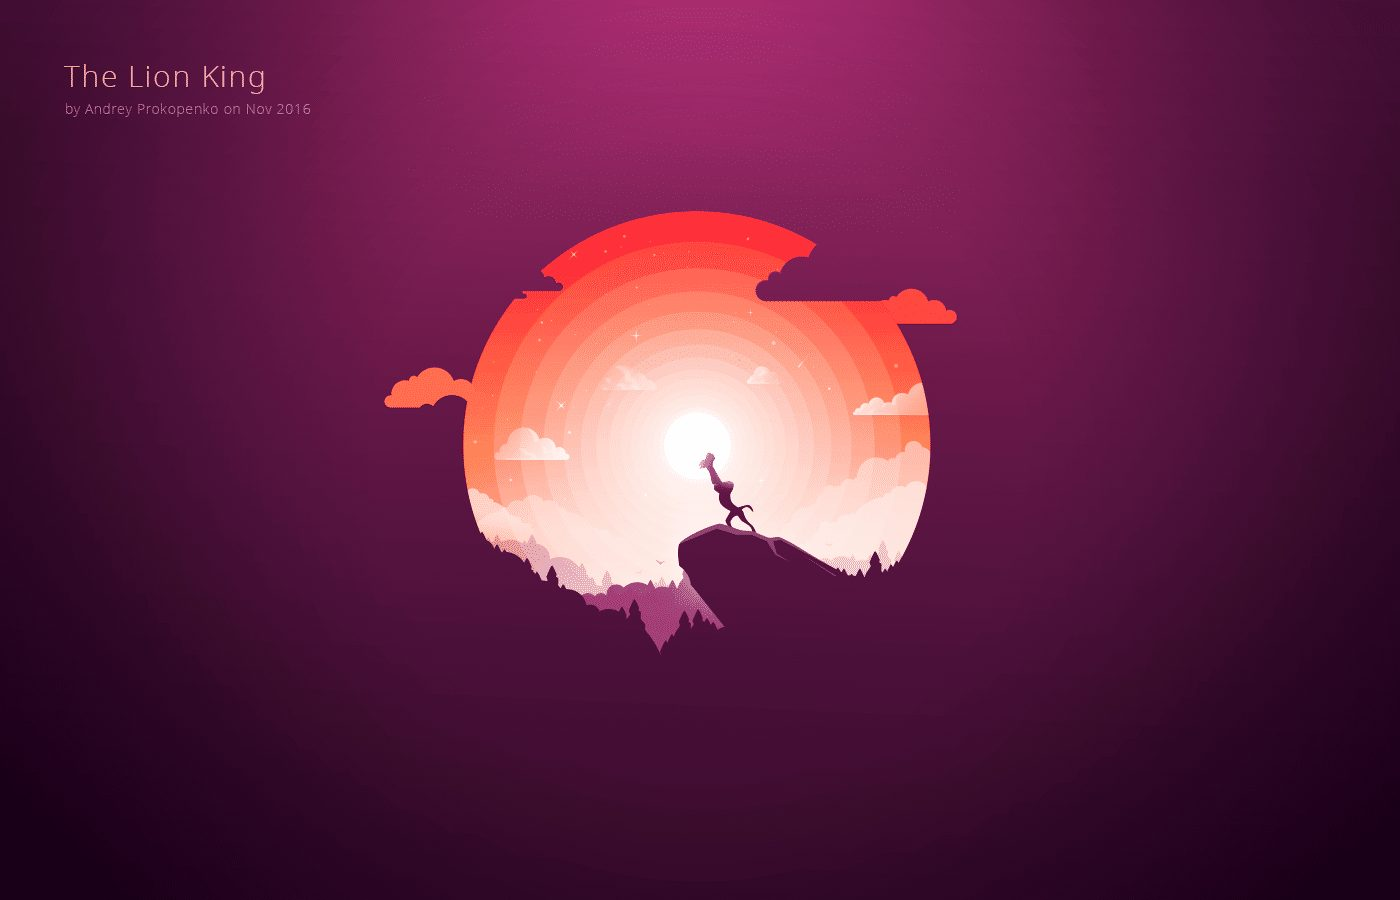 inspiring illustration by andrey prokopenko